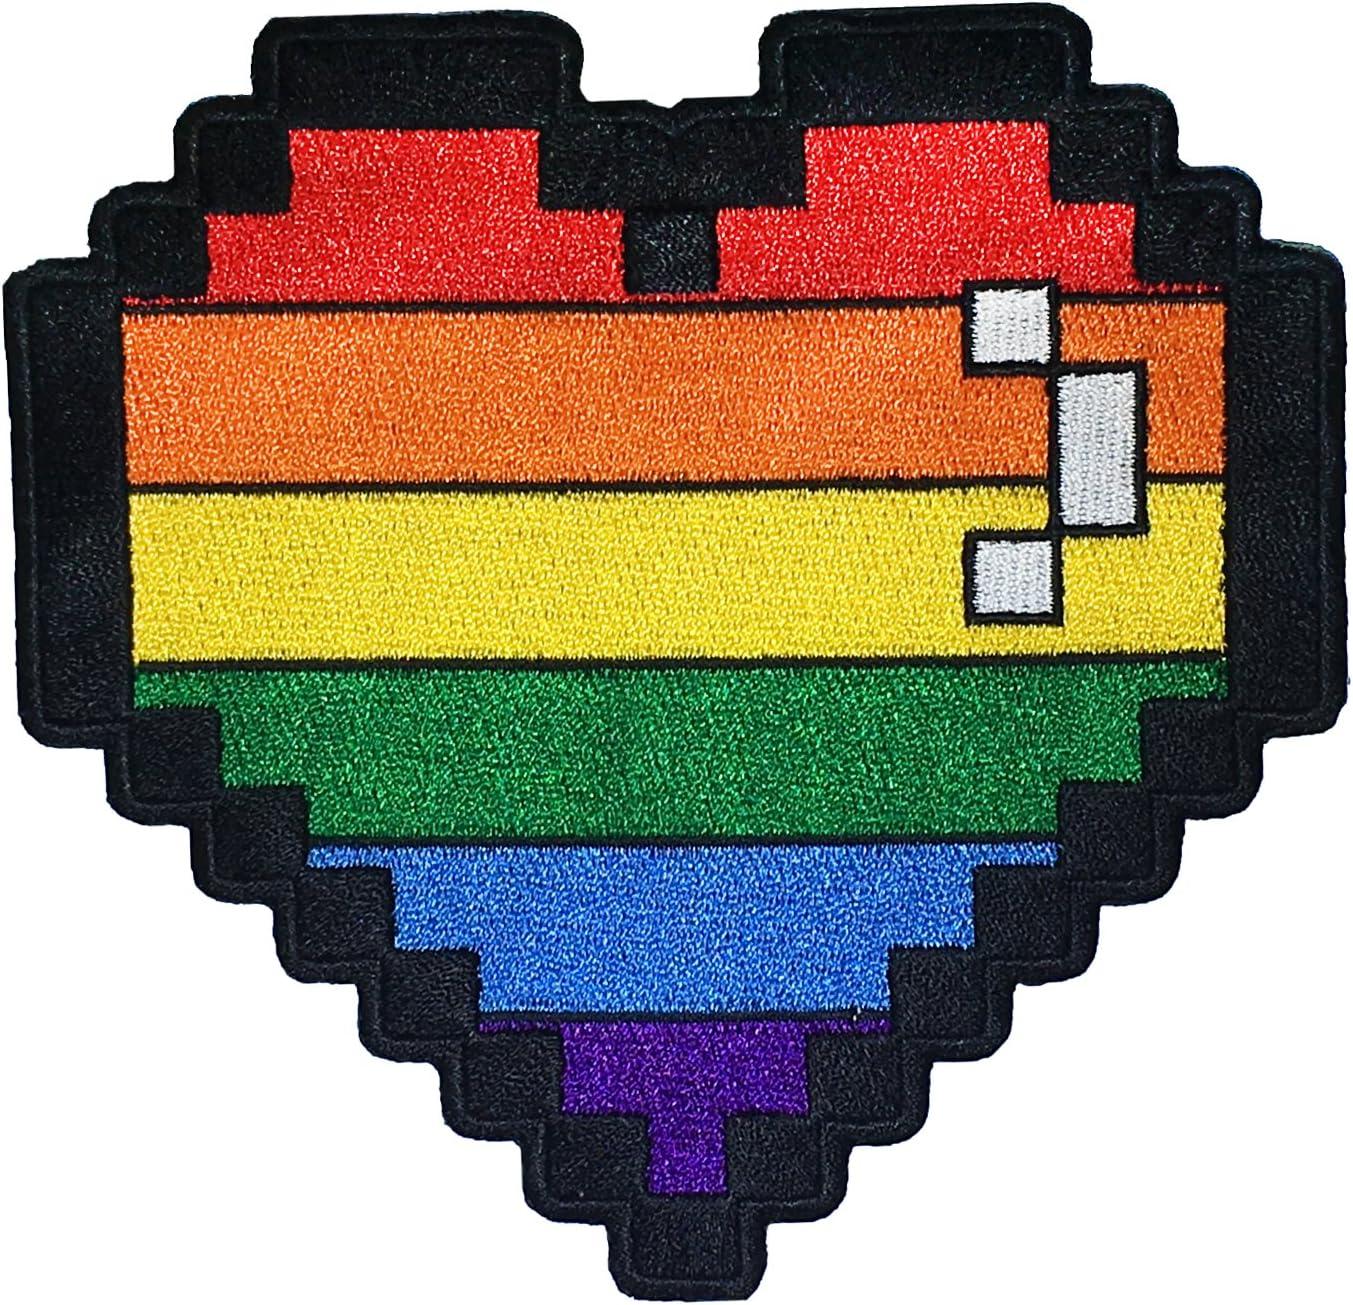 Rainbow 8 Bit Full Over item handling ☆ Life Overseas parallel import regular item Lives Gay Pride LGBT Gamer Lesbian Pixel